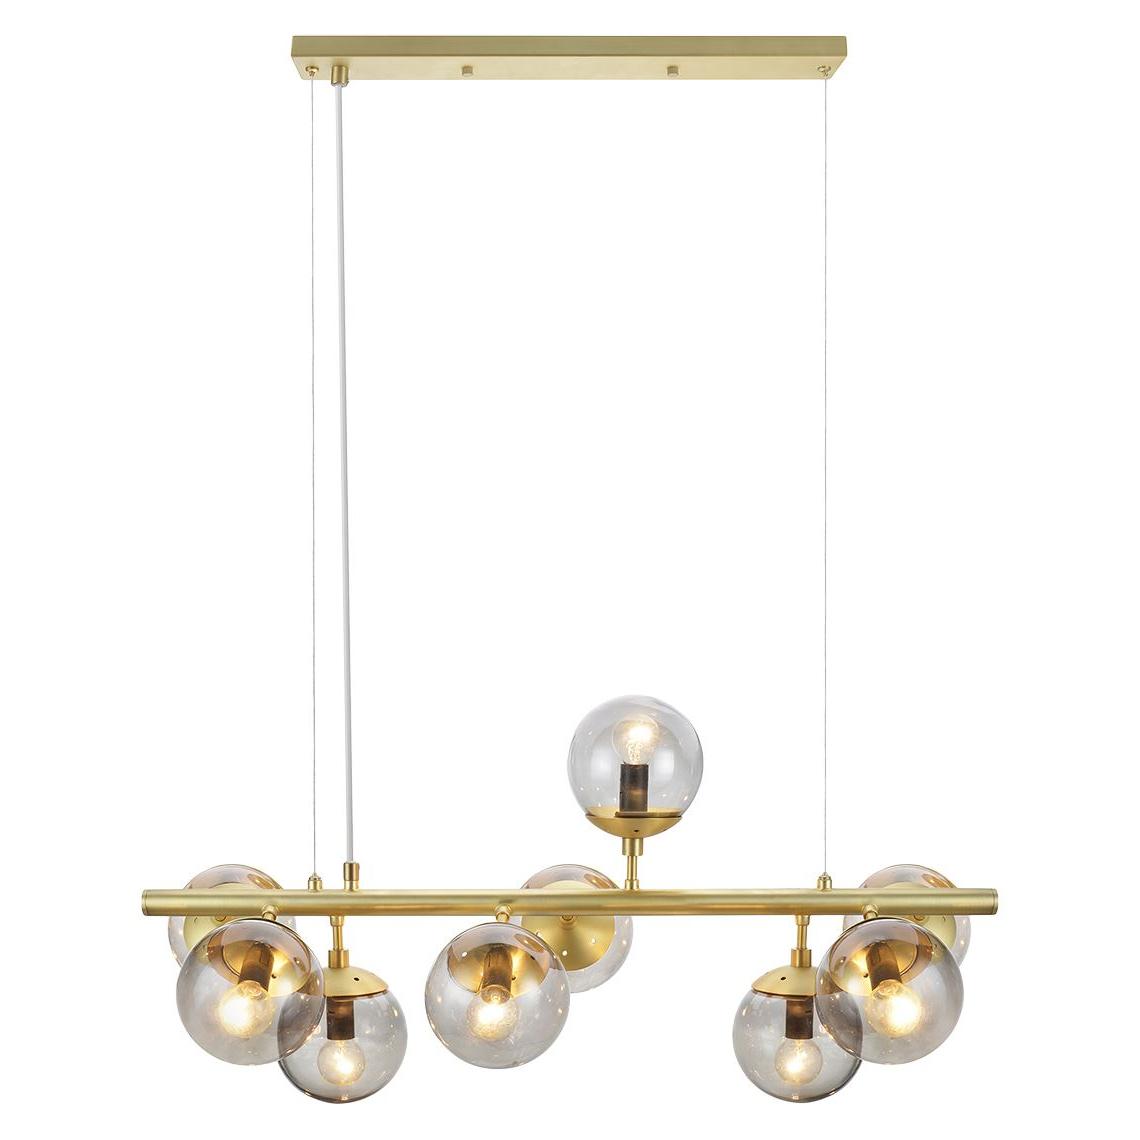 Paladino Pendant, Brass Colour Regarding Most Up To Date Paladino 6 Light Chandeliers (Gallery 10 of 20)